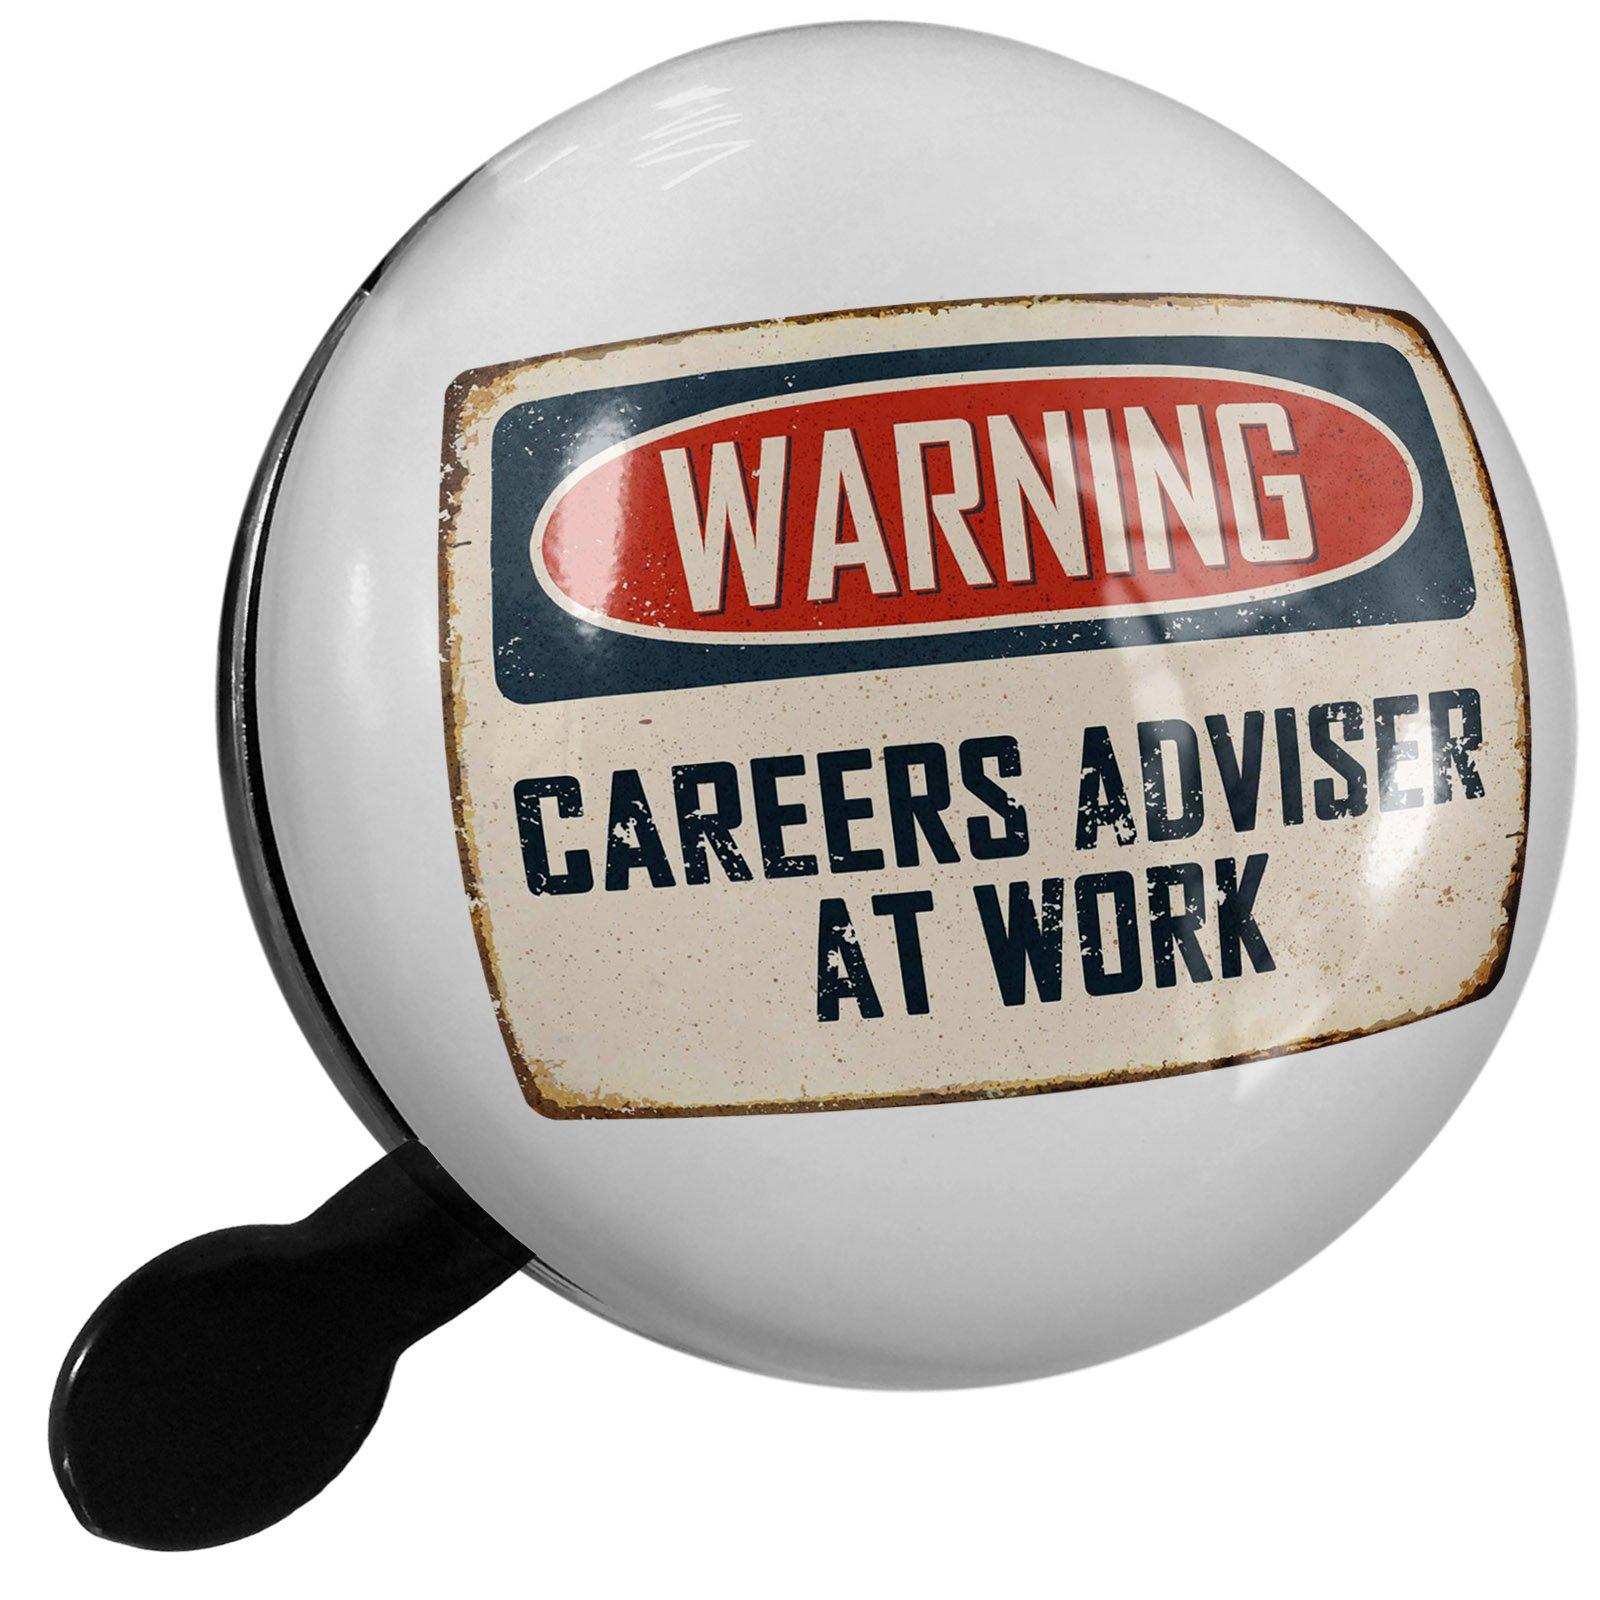 Small Bike Bell Warning Careers Adviser At Work Vintage Fun Job Sign - NEONBLOND